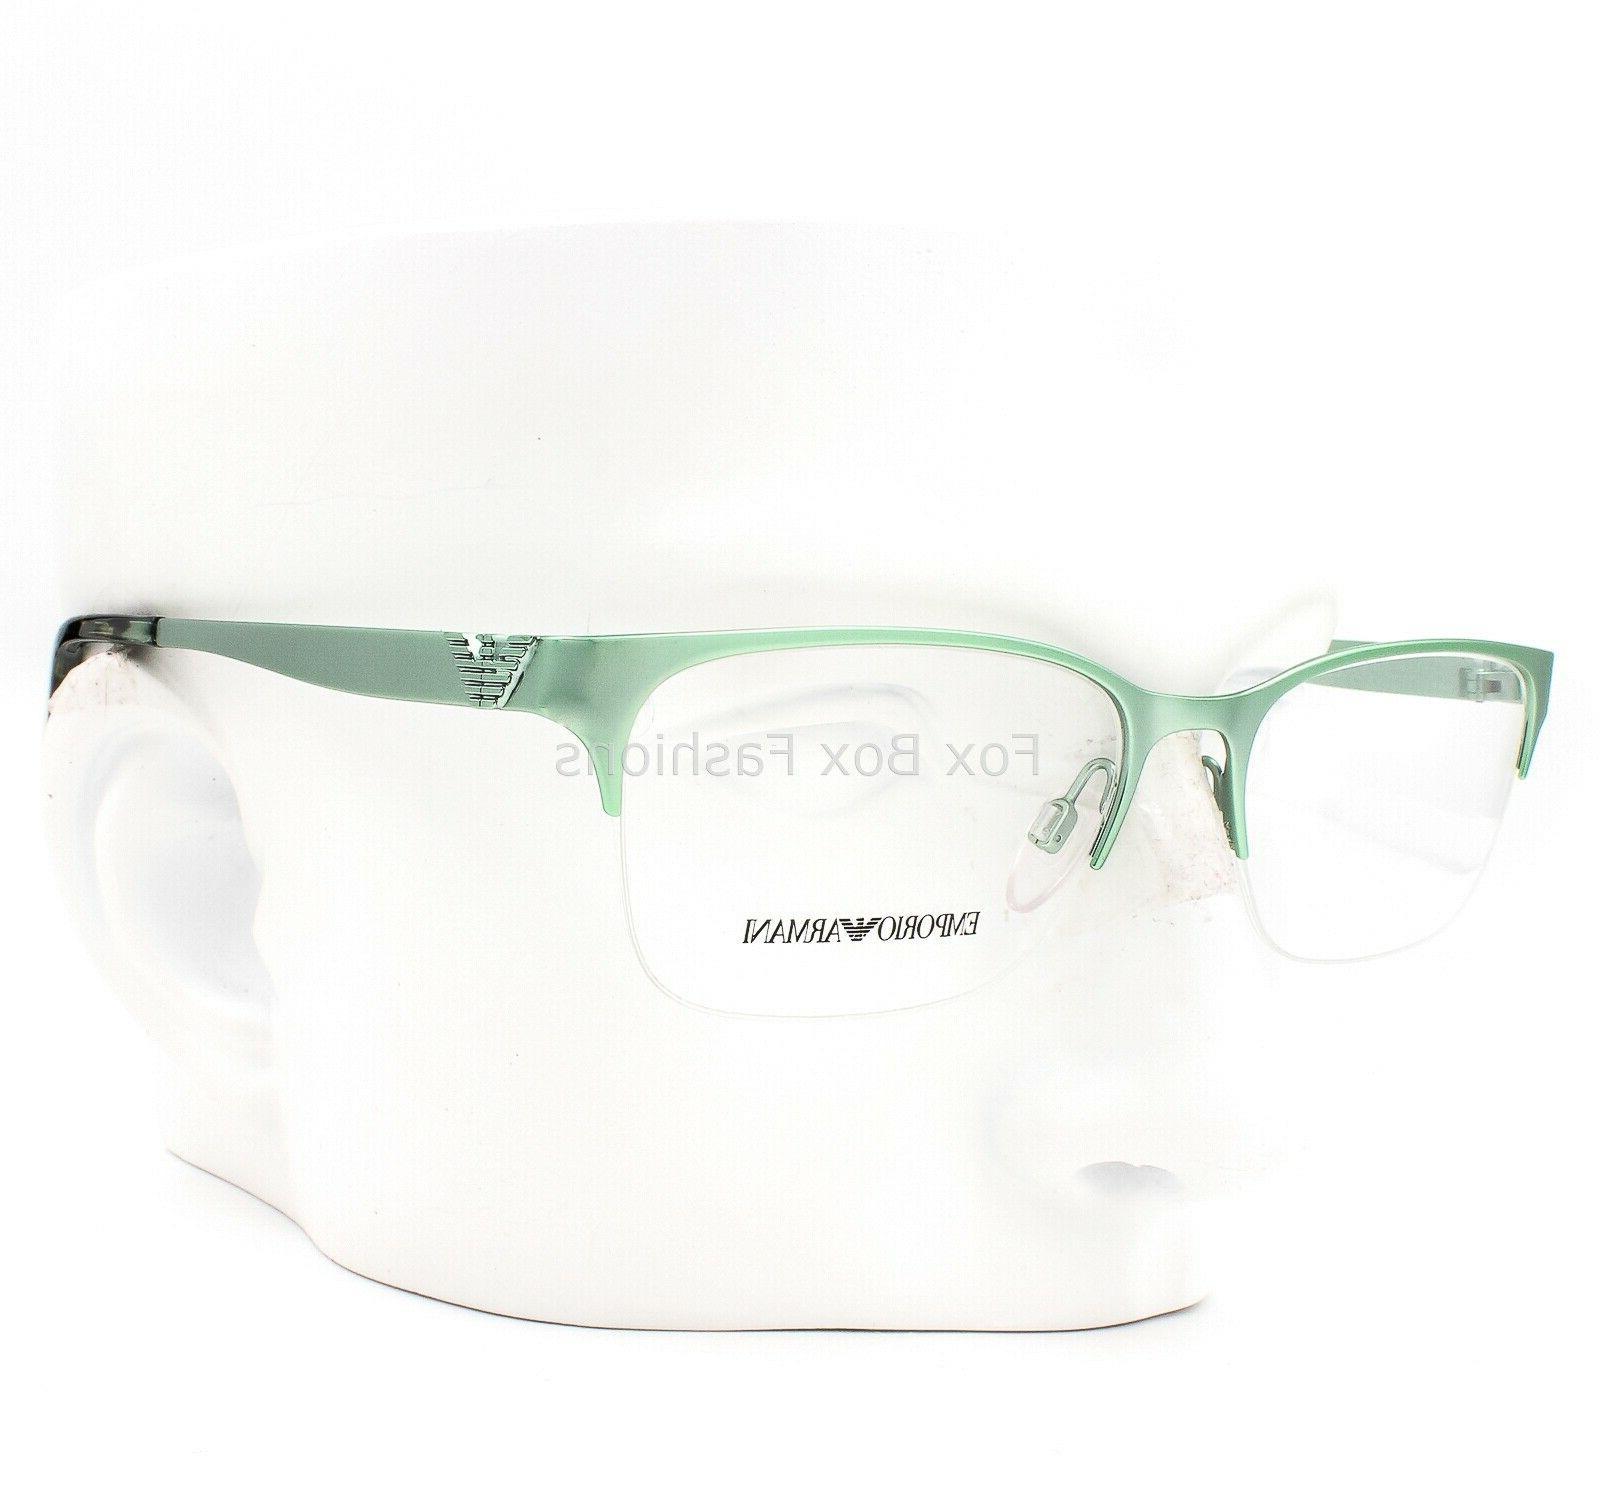 ea 1019 3075 semi rimless eyeglasses glasses